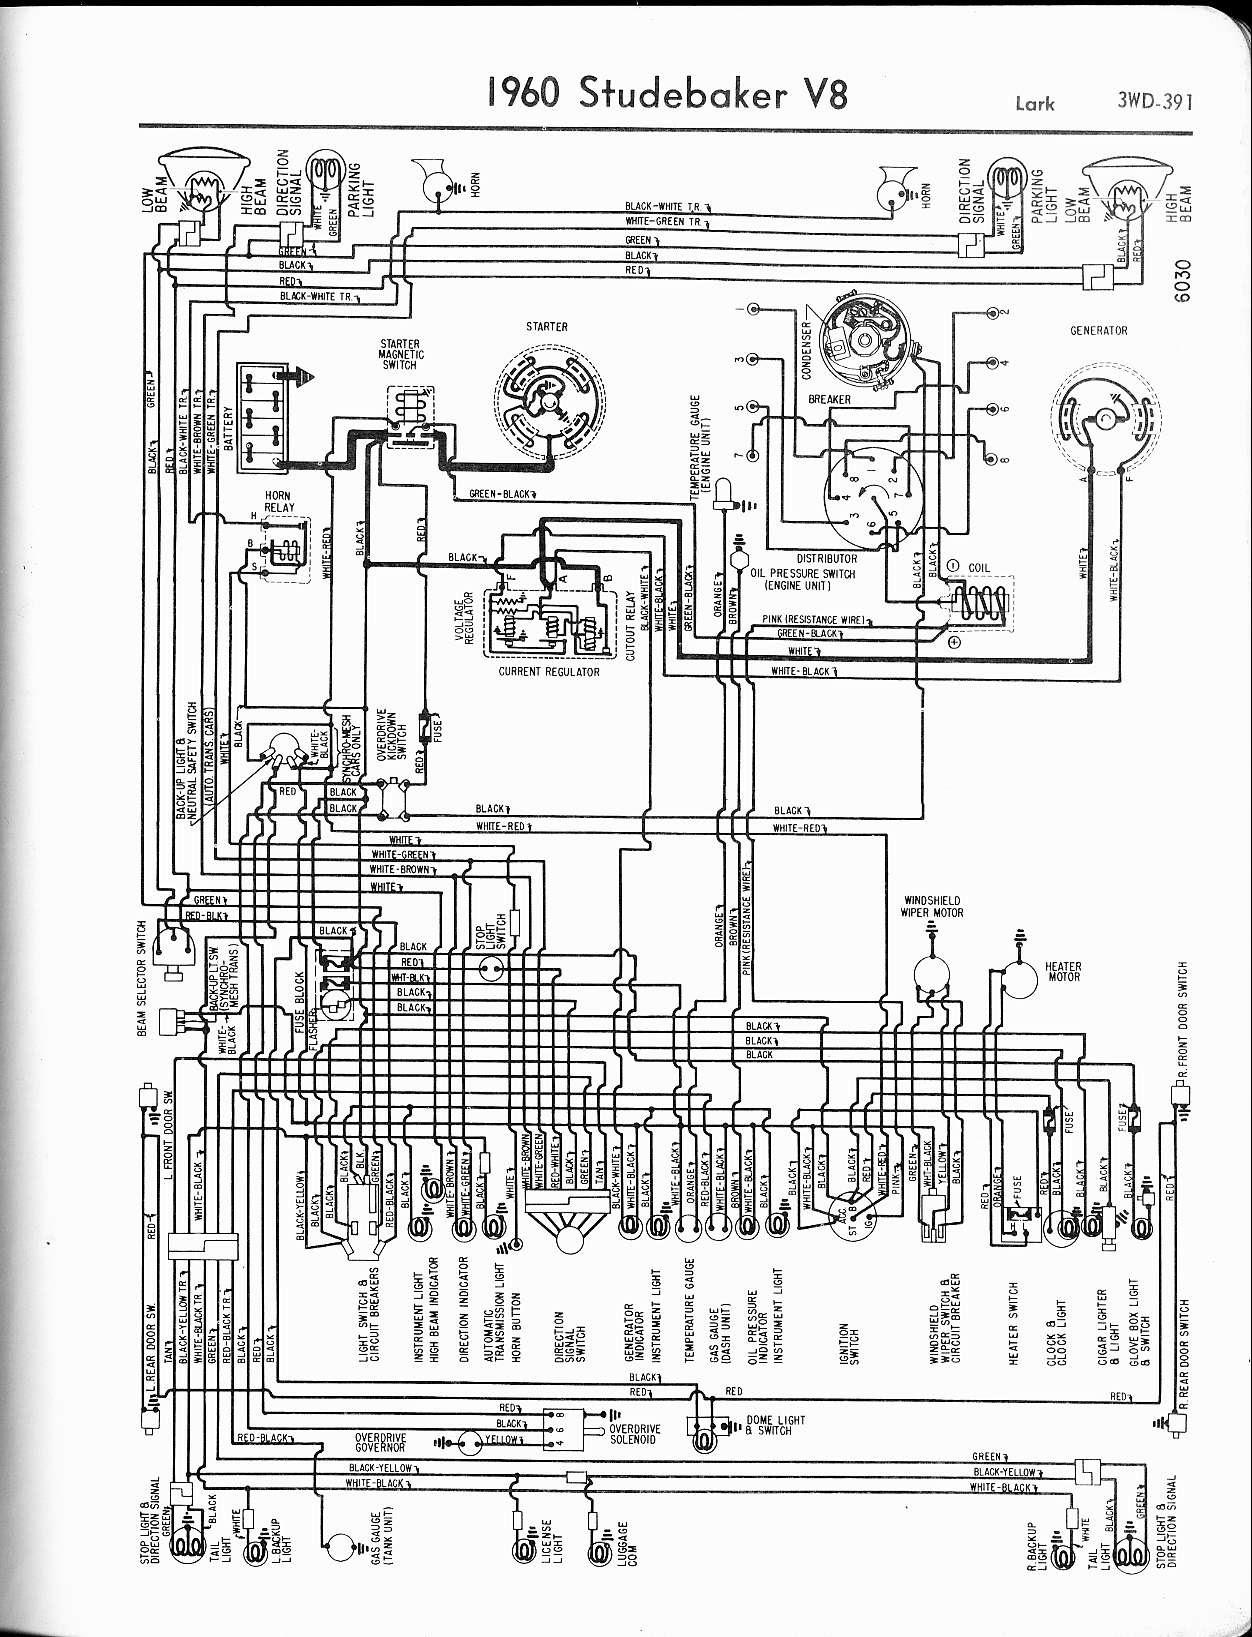 Diagram 1950 Studebaker Wiring Diagram Full Version Hd Quality Wiring Diagram Lspwiring2 Creasitionline It